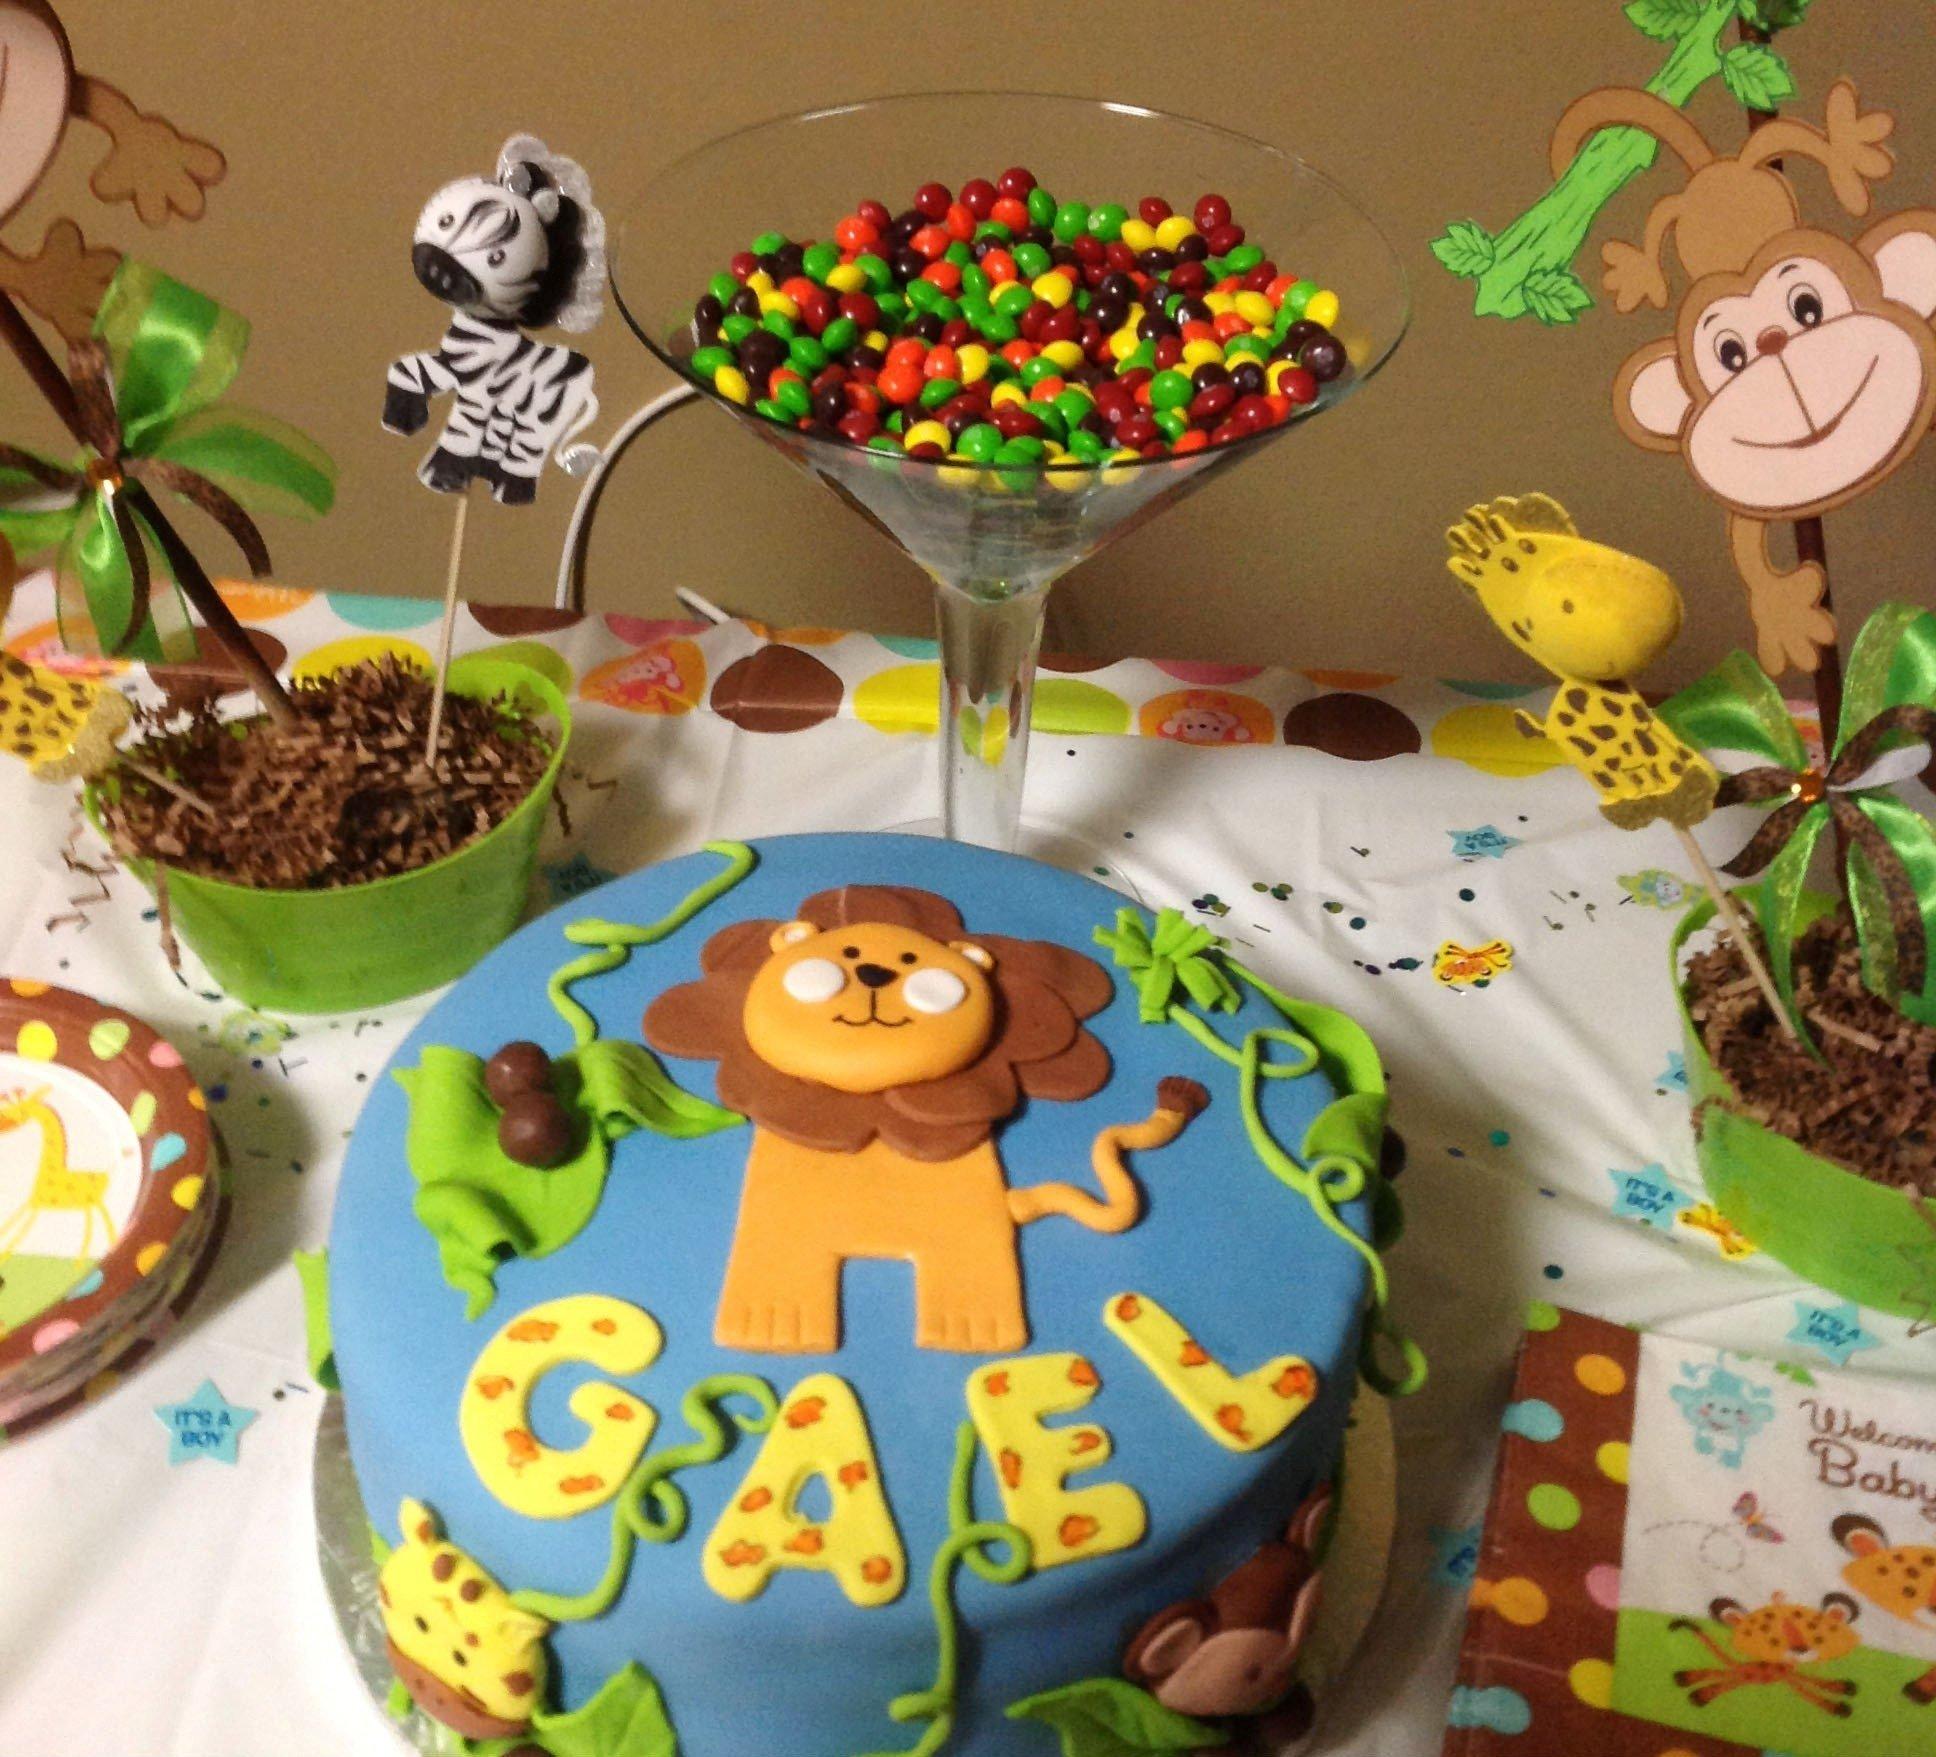 10 Famous Baby Shower Safari Theme Ideas party city safari baby shower theme liviroom decors party city 2020